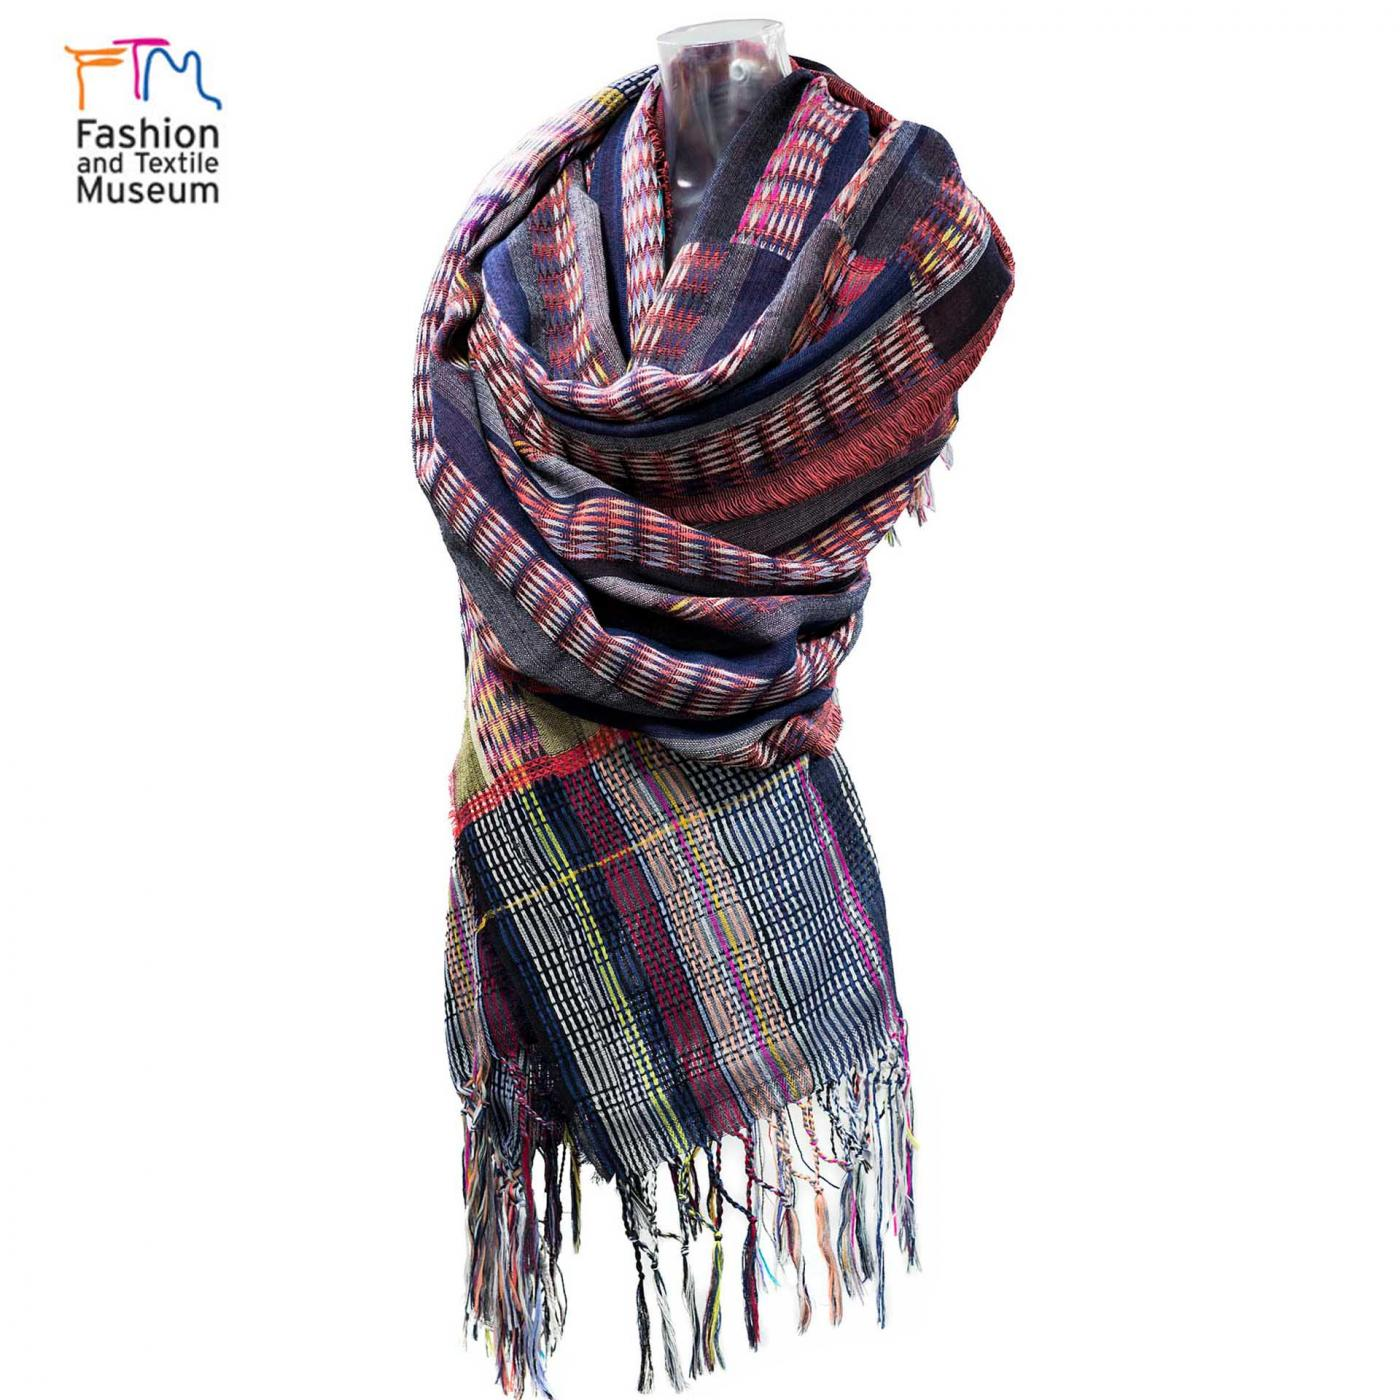 Fashion & Textile Museum – Made in Mexico rebozo wrap